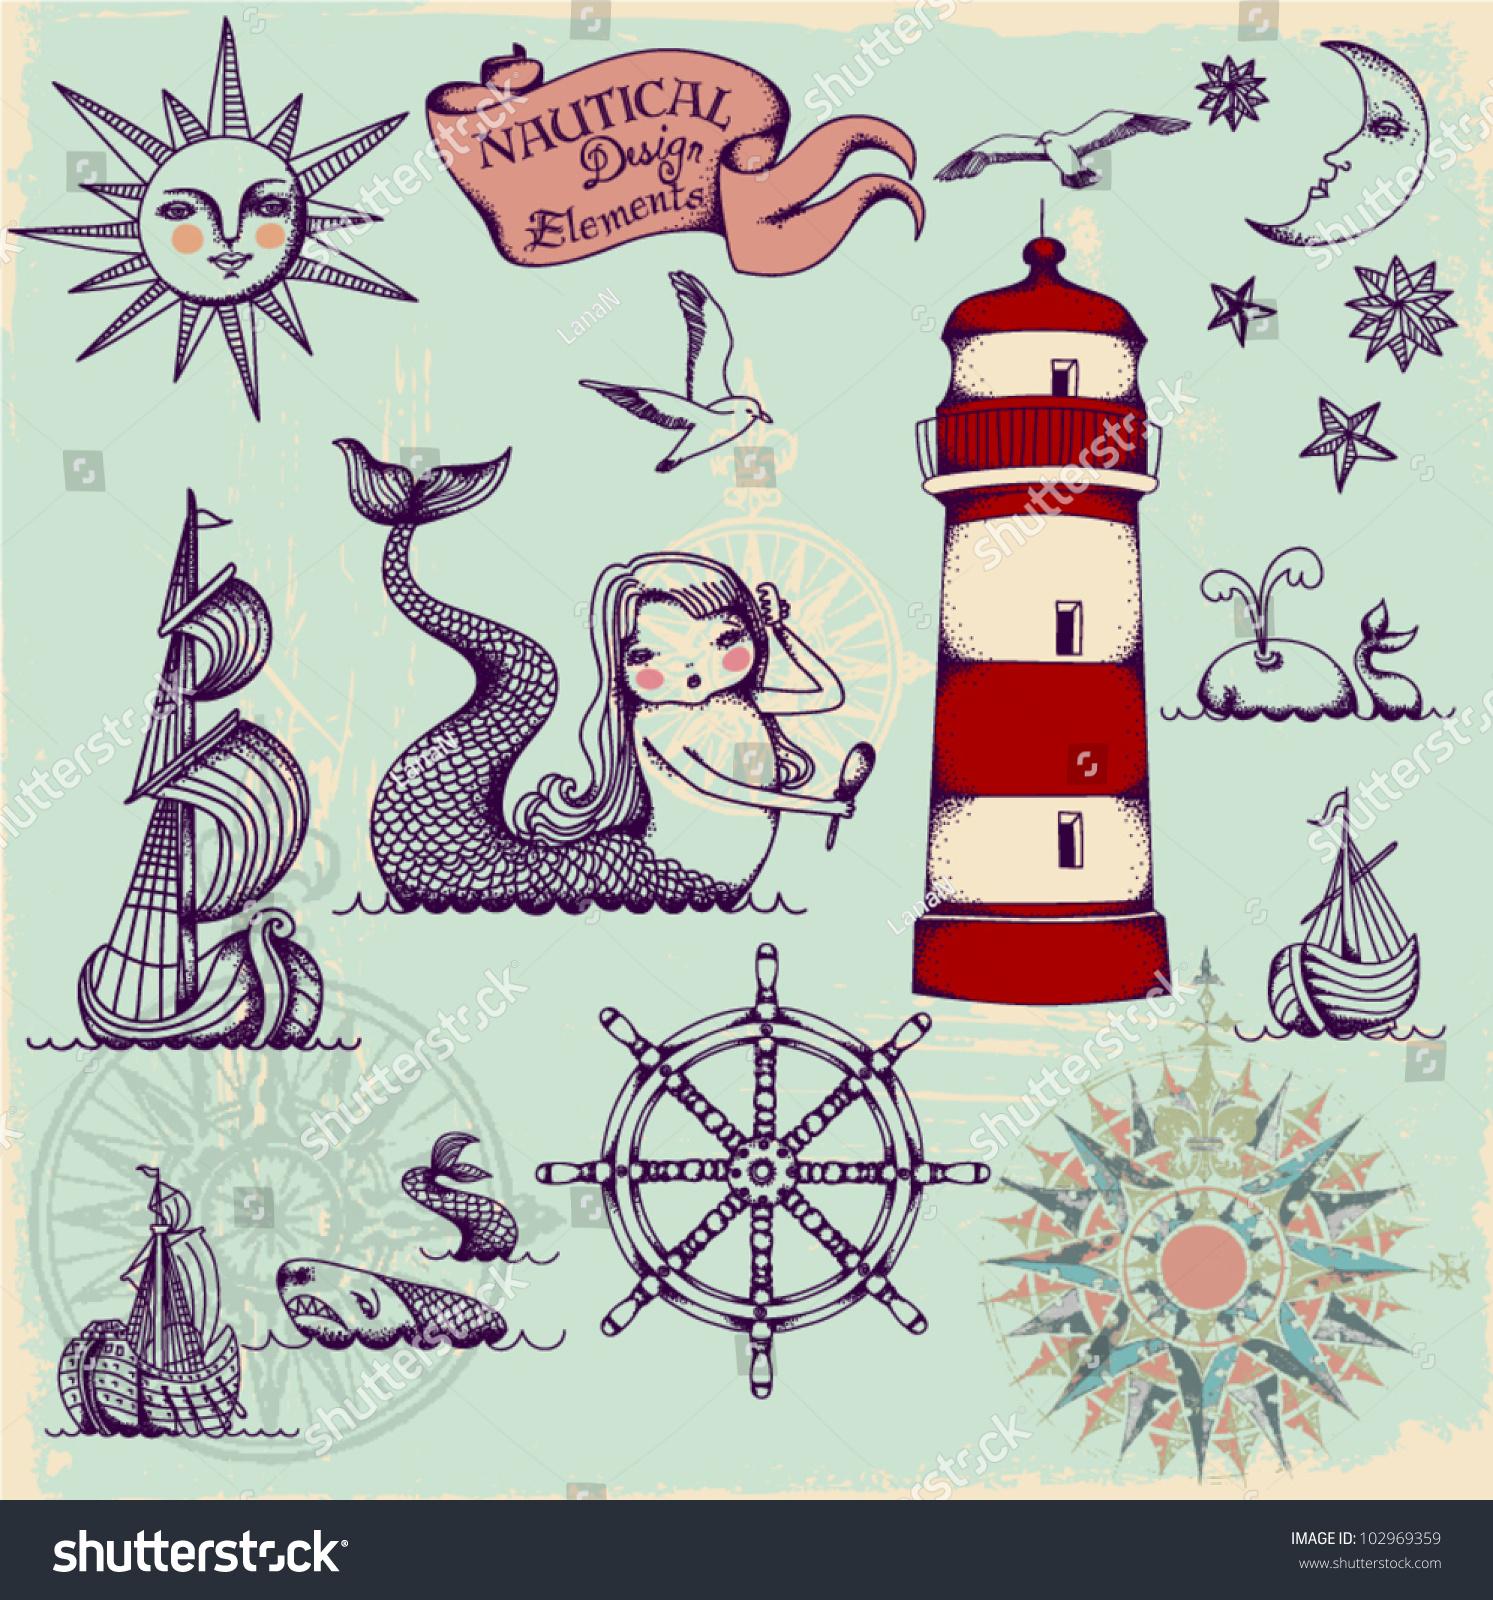 Key Elements Of Nautical Style: Whimsical Set Of Hand Drawn